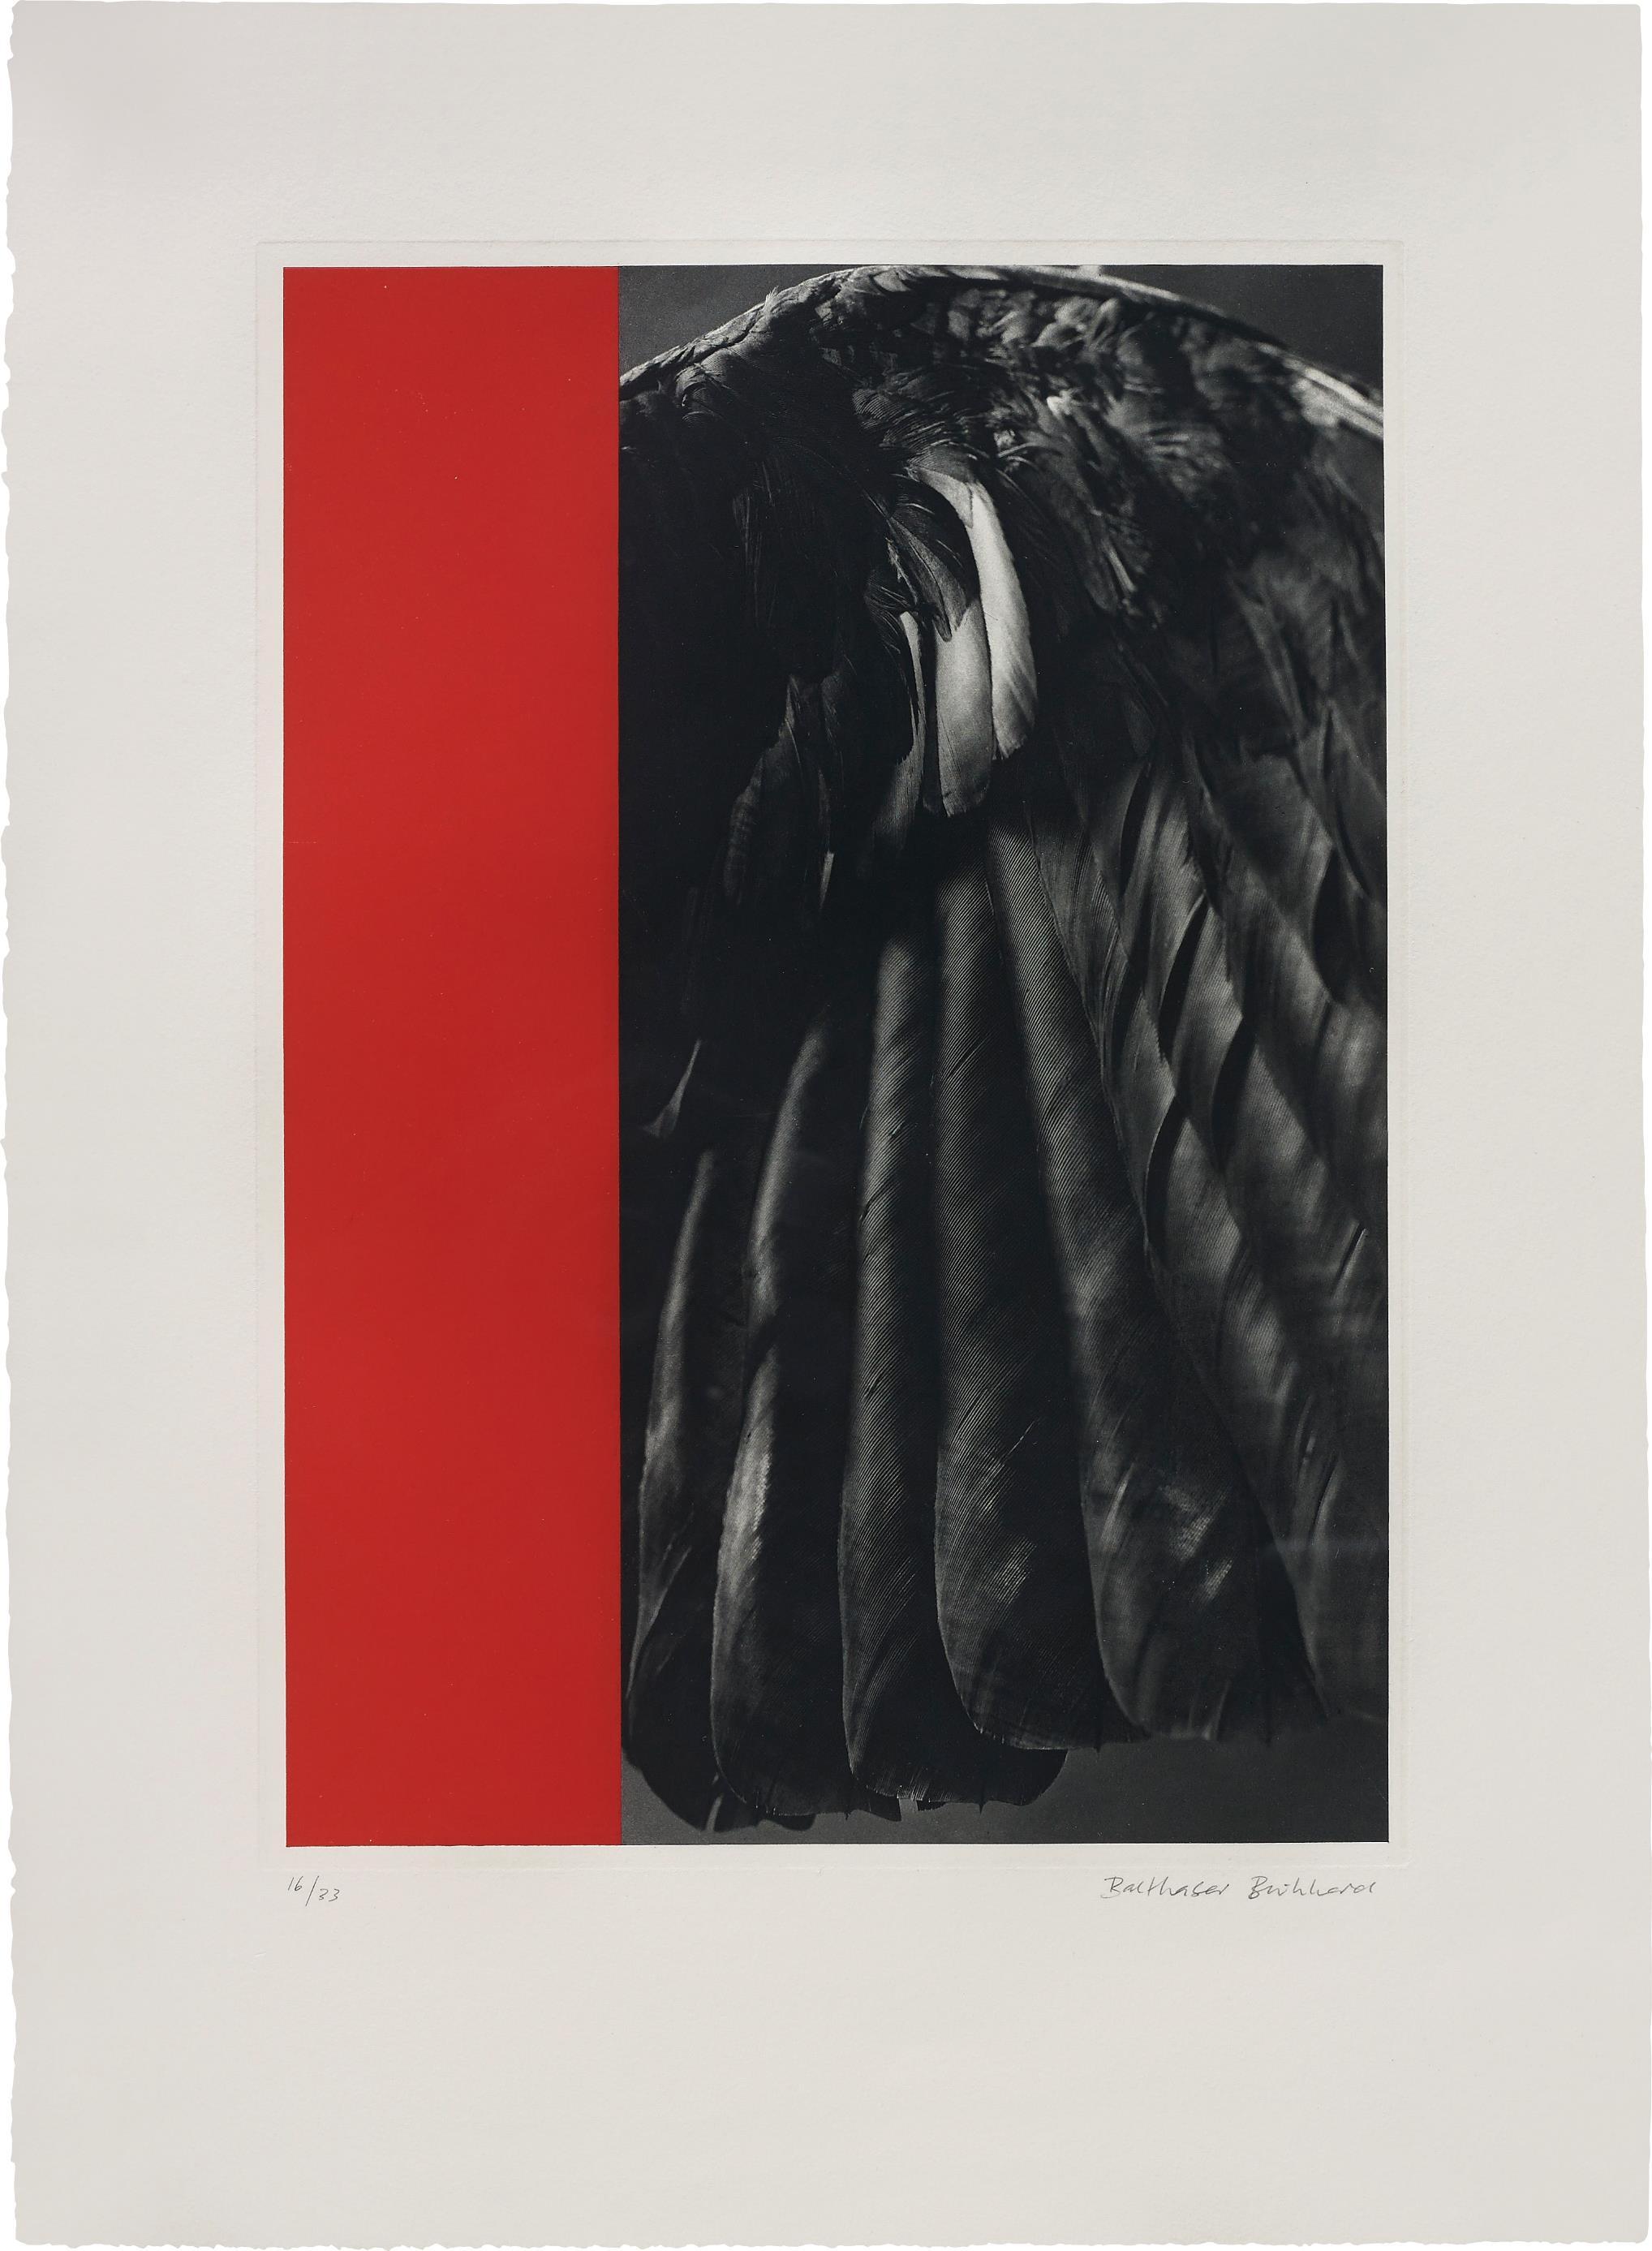 Balthasar Burkhard-Crow-Wing and Monochrome-1988